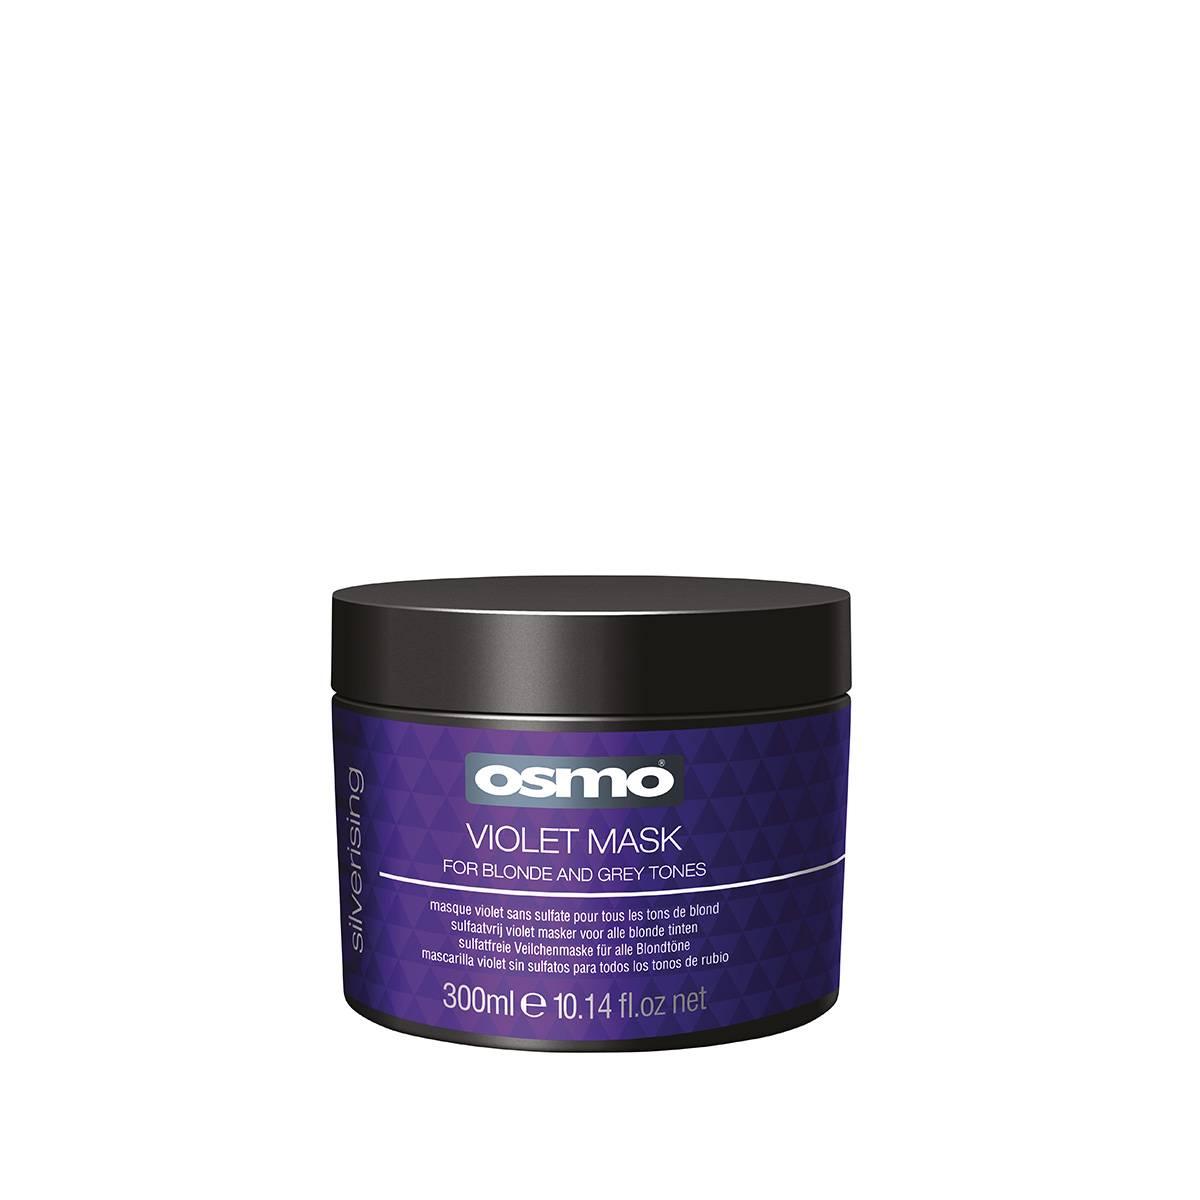 Silverising Violet Mask 300ml Colour Mission